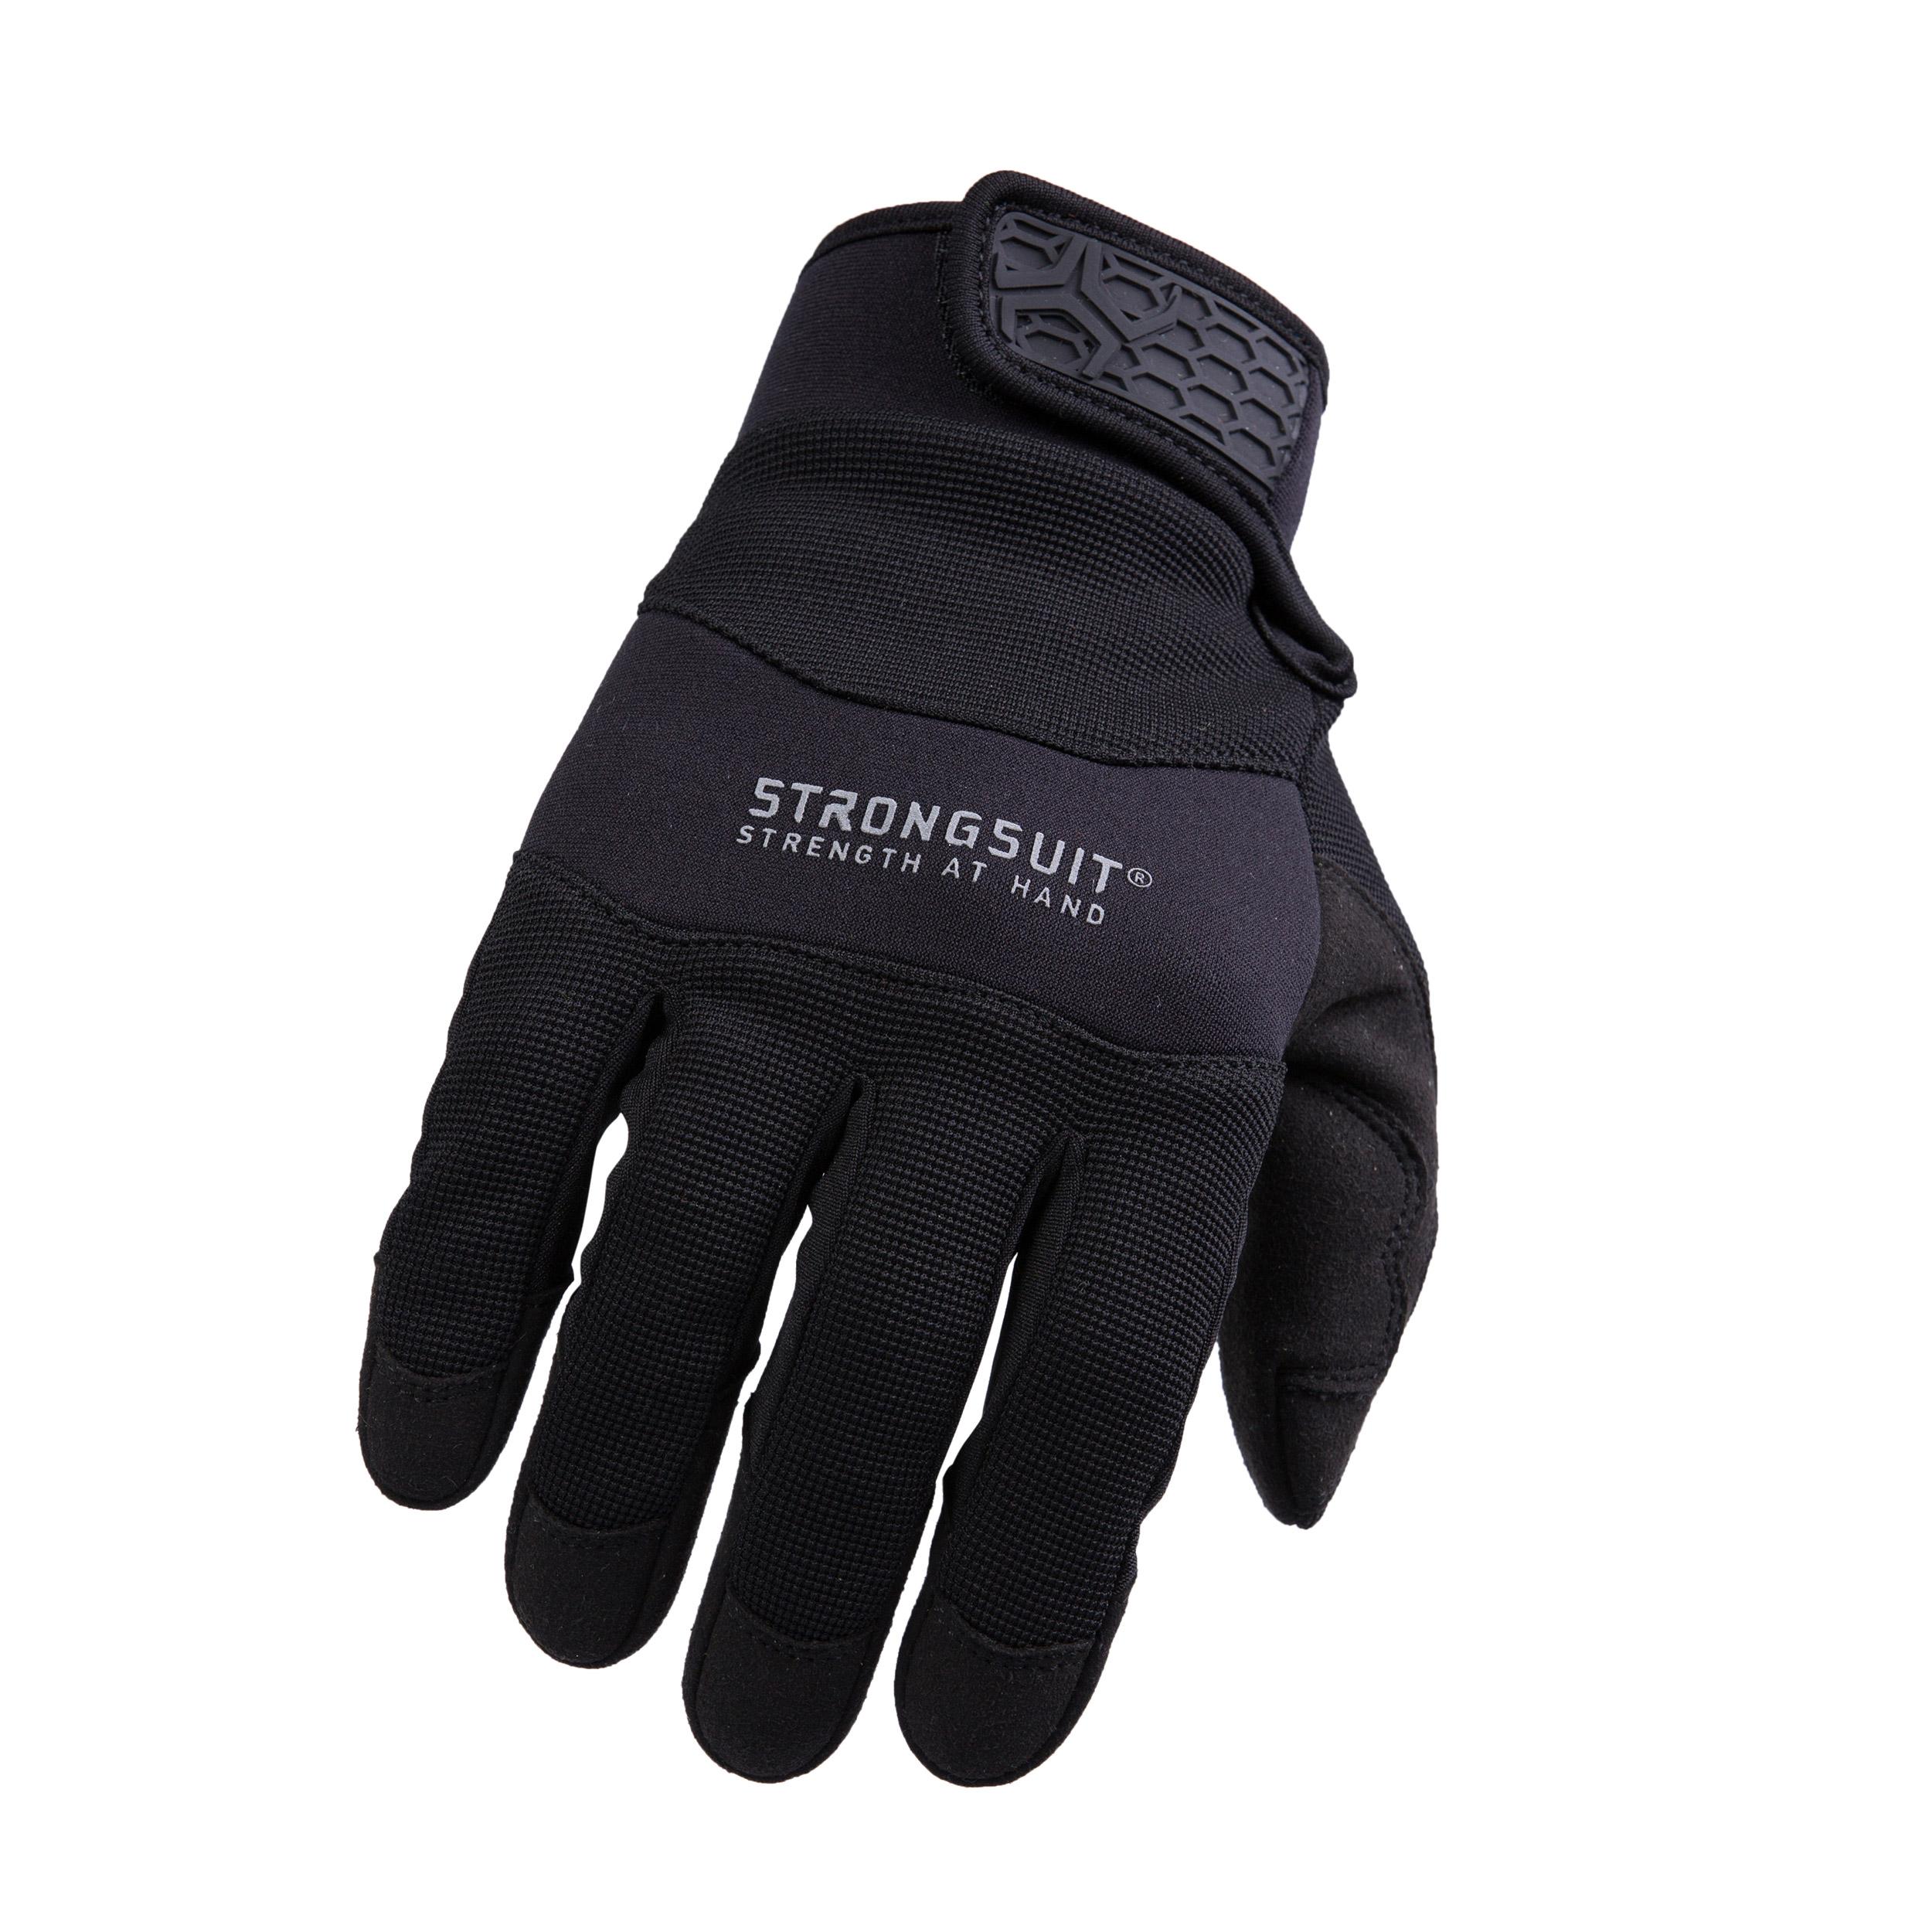 Armor3 Gloves, Small